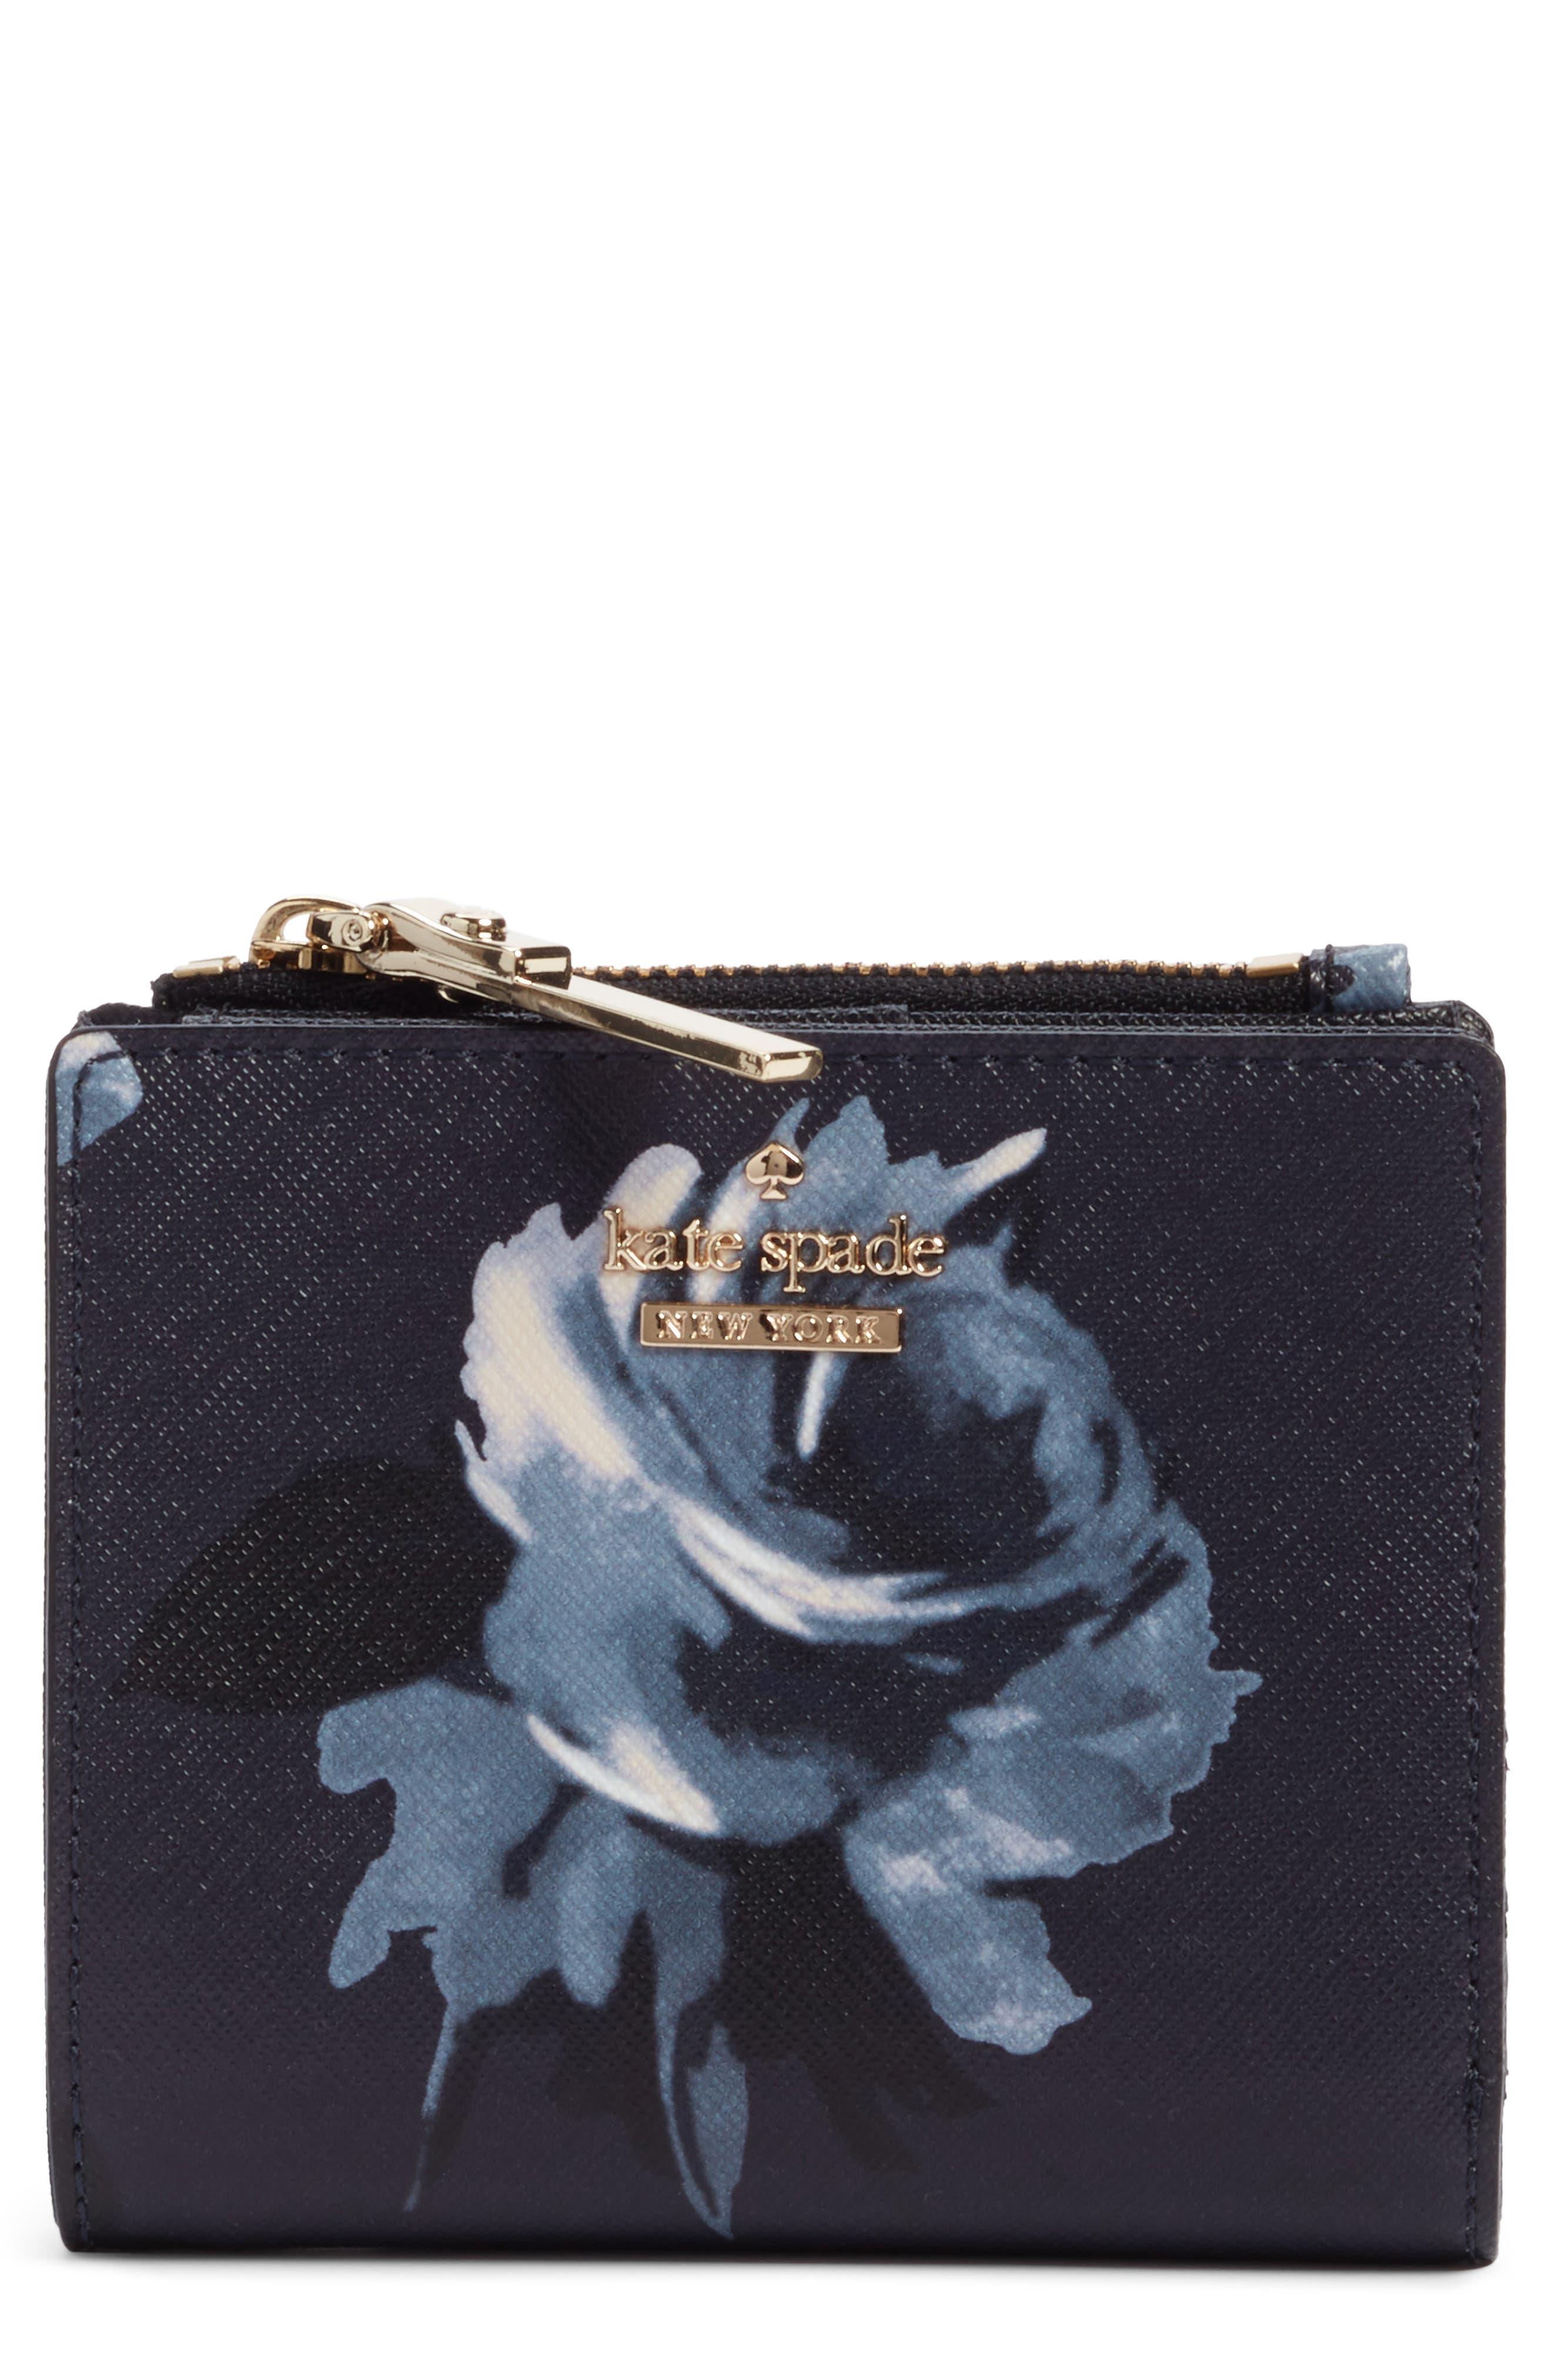 Alternate Image 1 Selected - kate spade new york cameron street - adalyn faux leather wallet